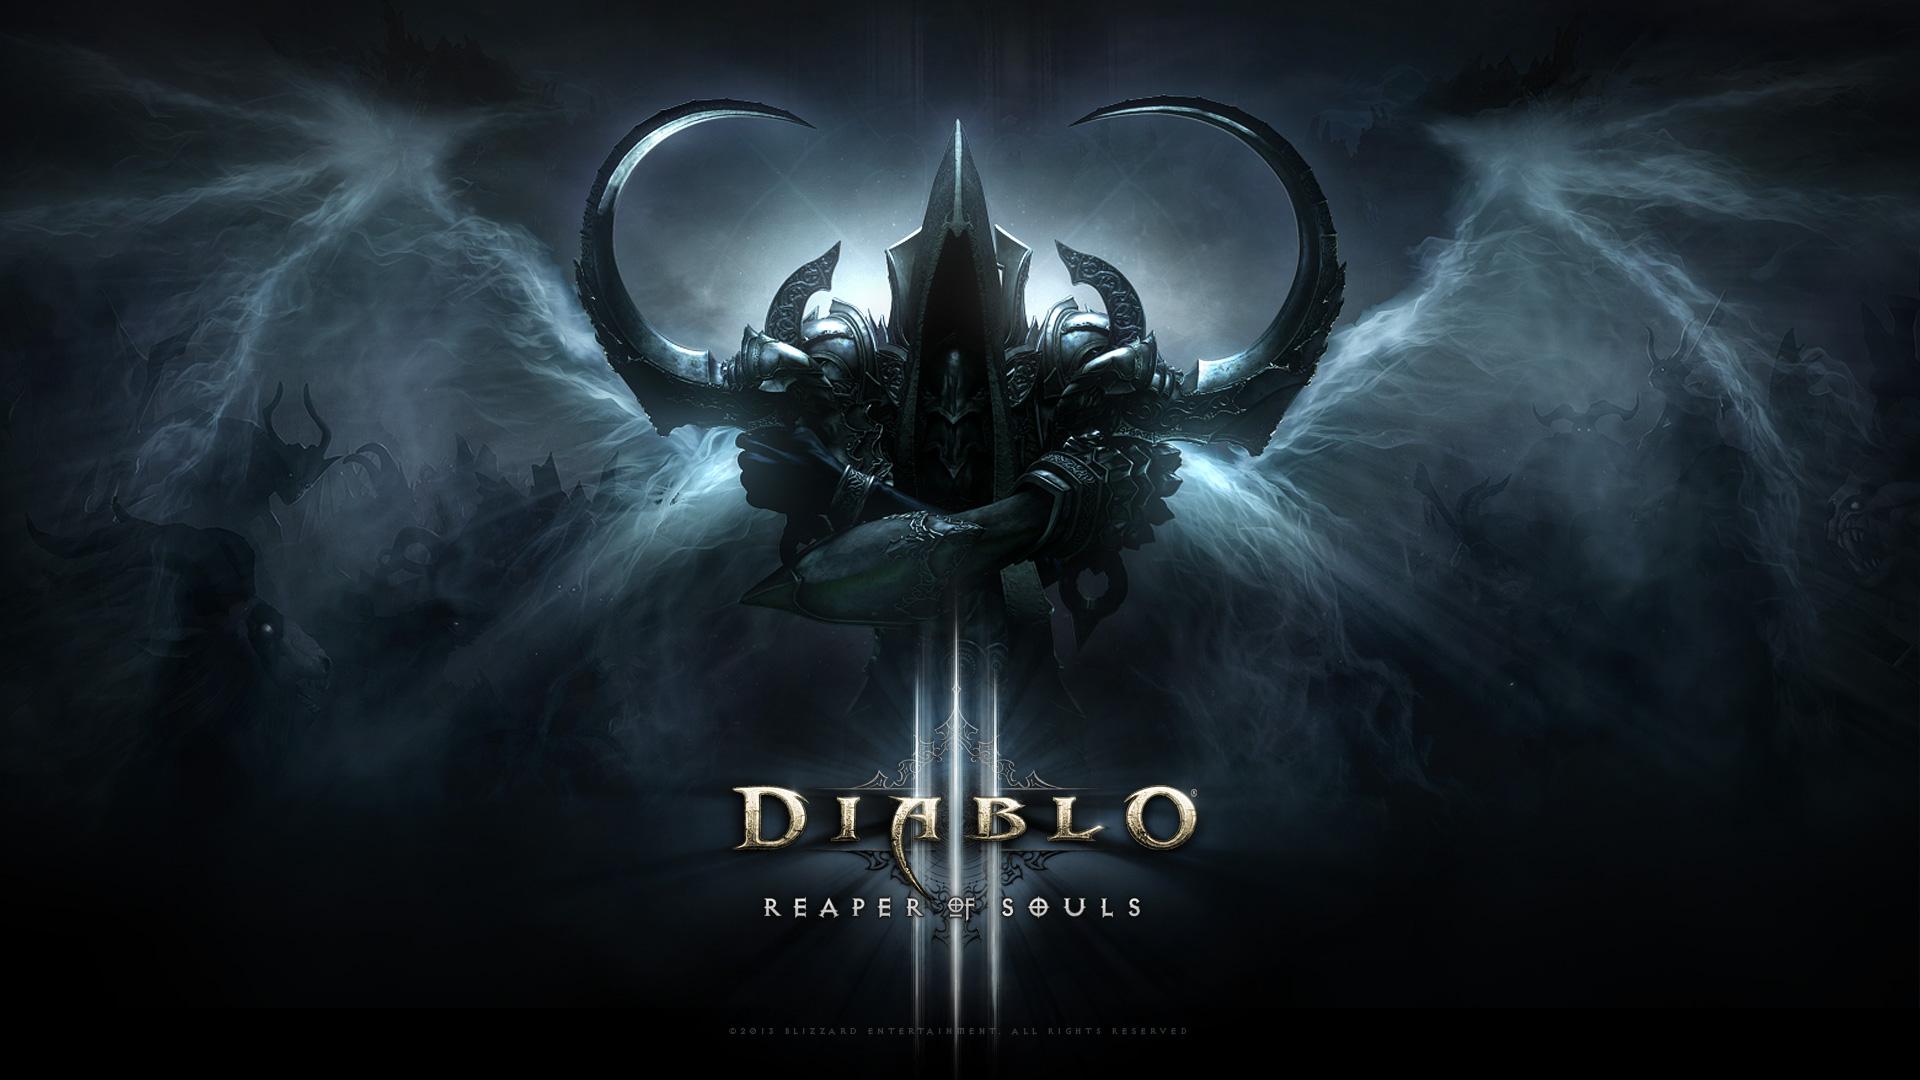 Diablo III: Reaper of Souls dezvaluie noi modalitati de joc [VIDEO]